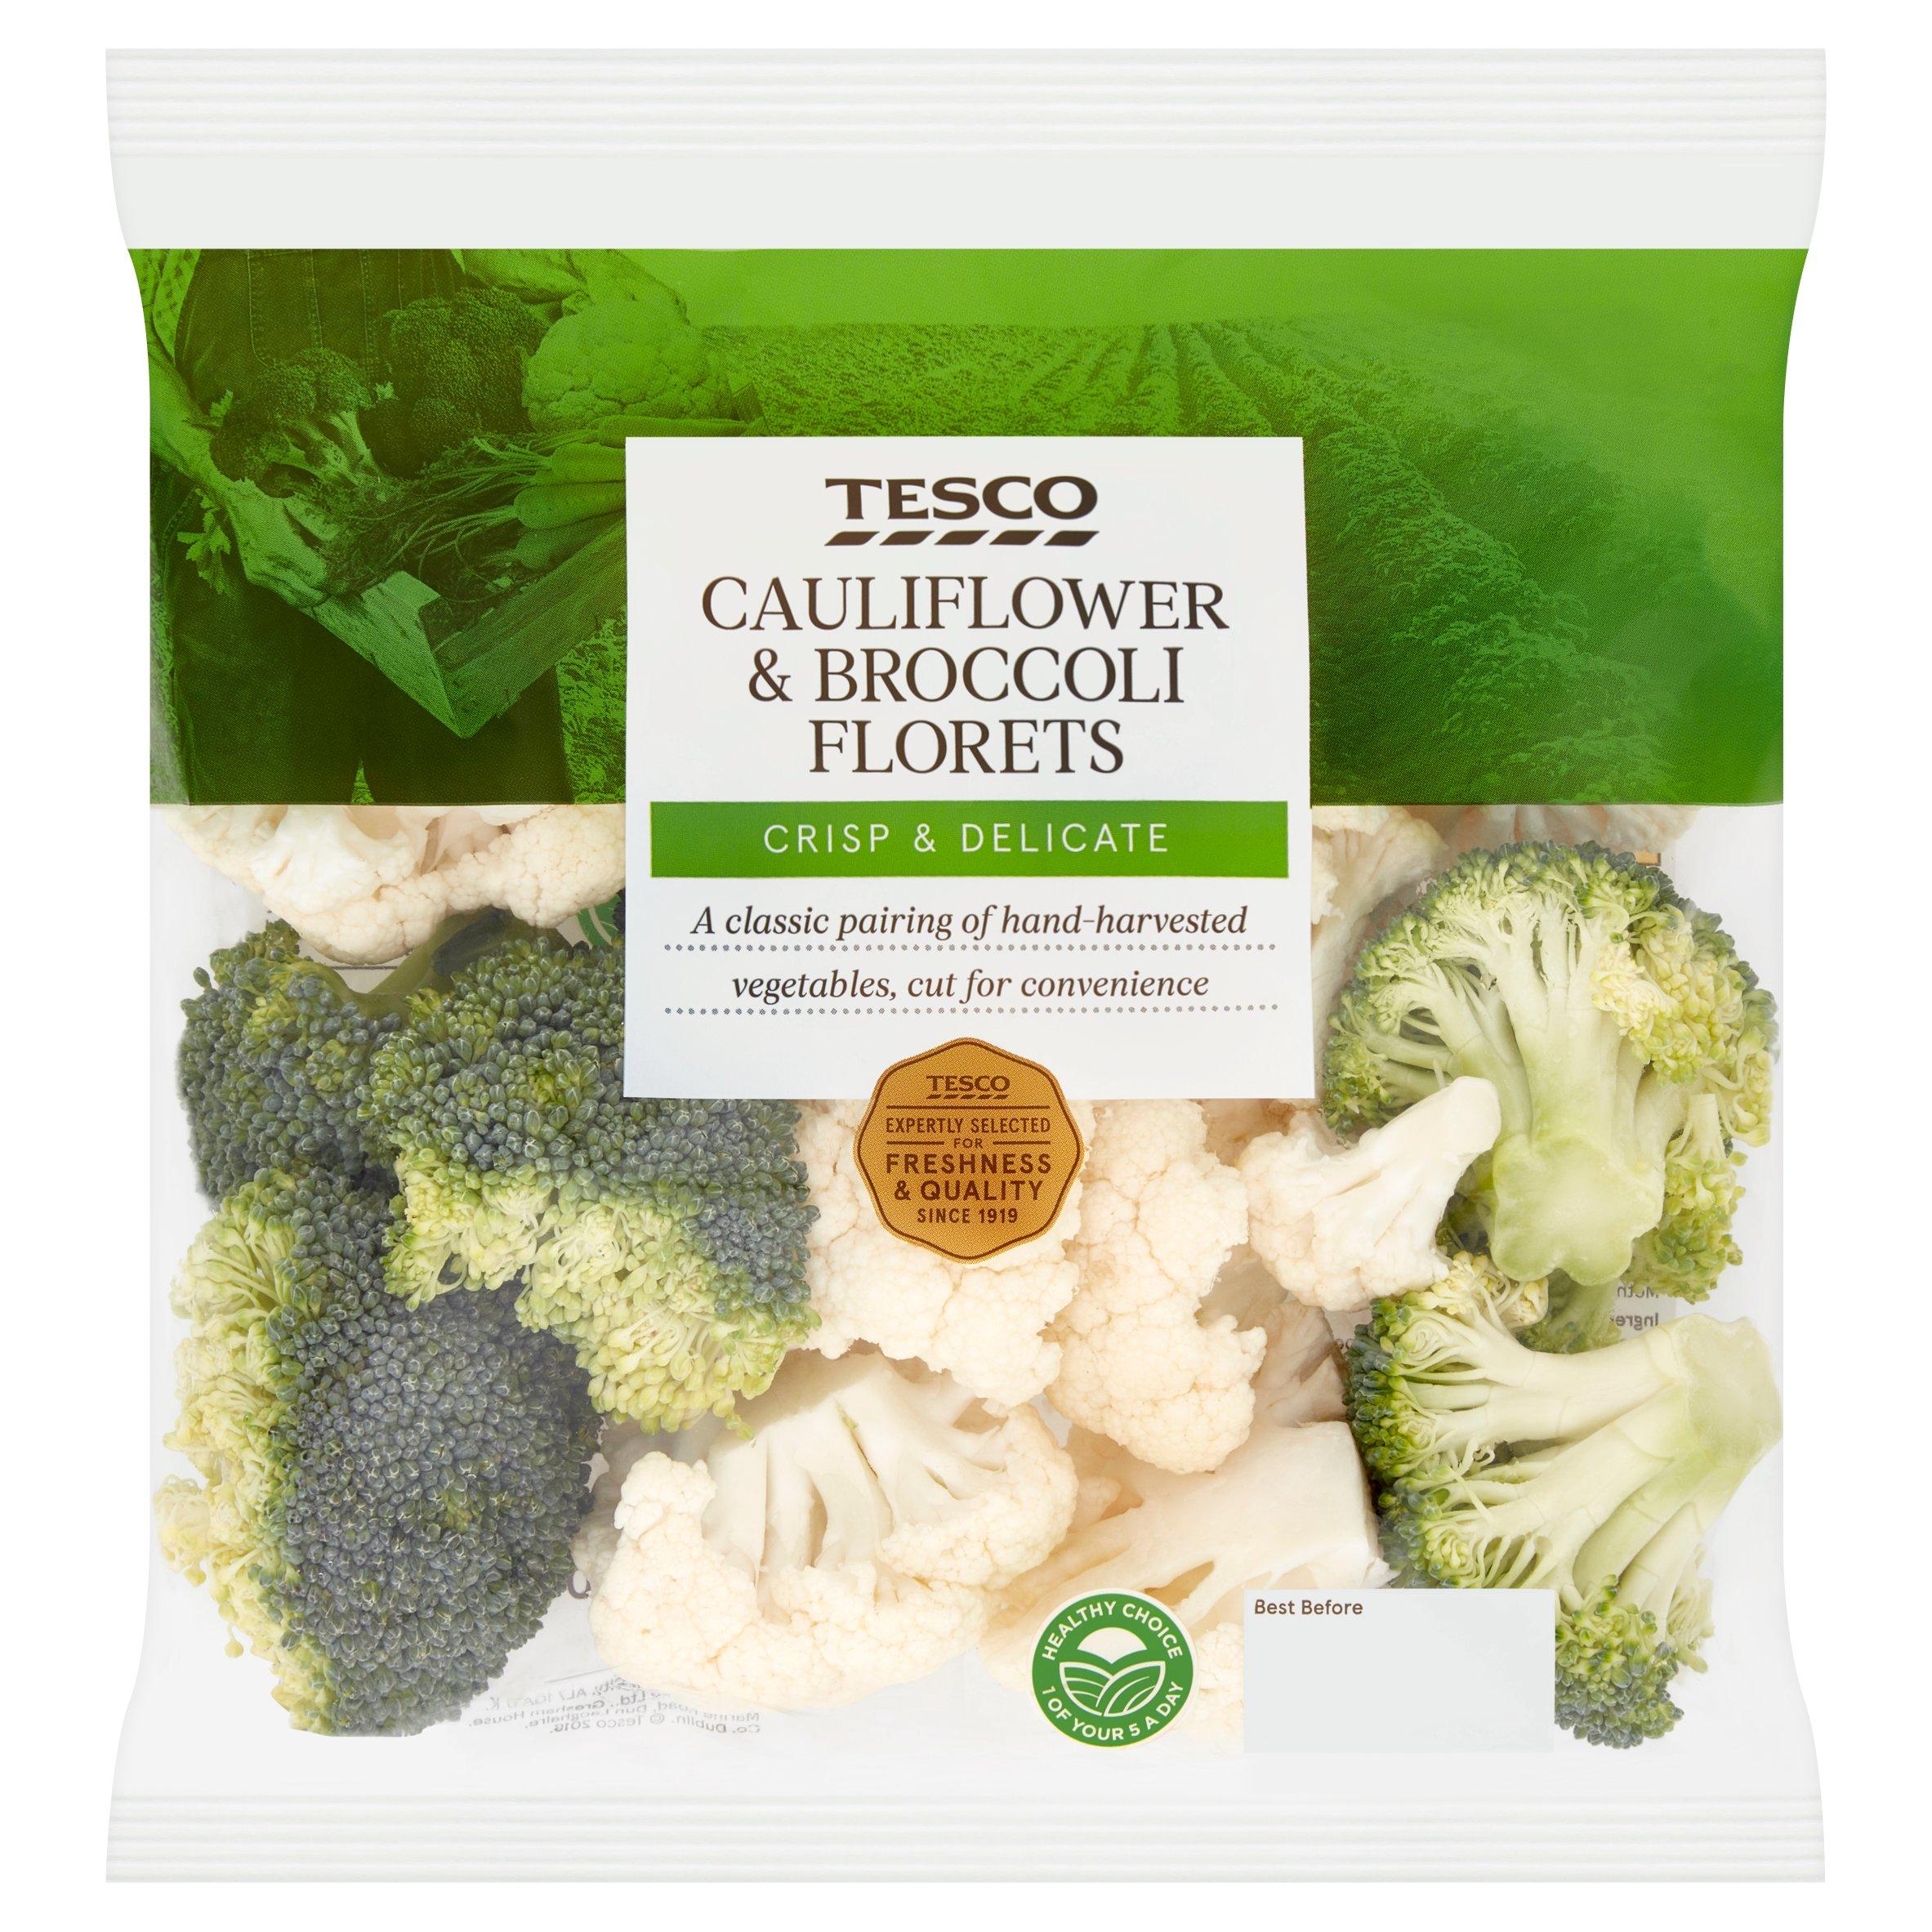 Tesco Cauliflower & Brocolli Florets 400G (M)